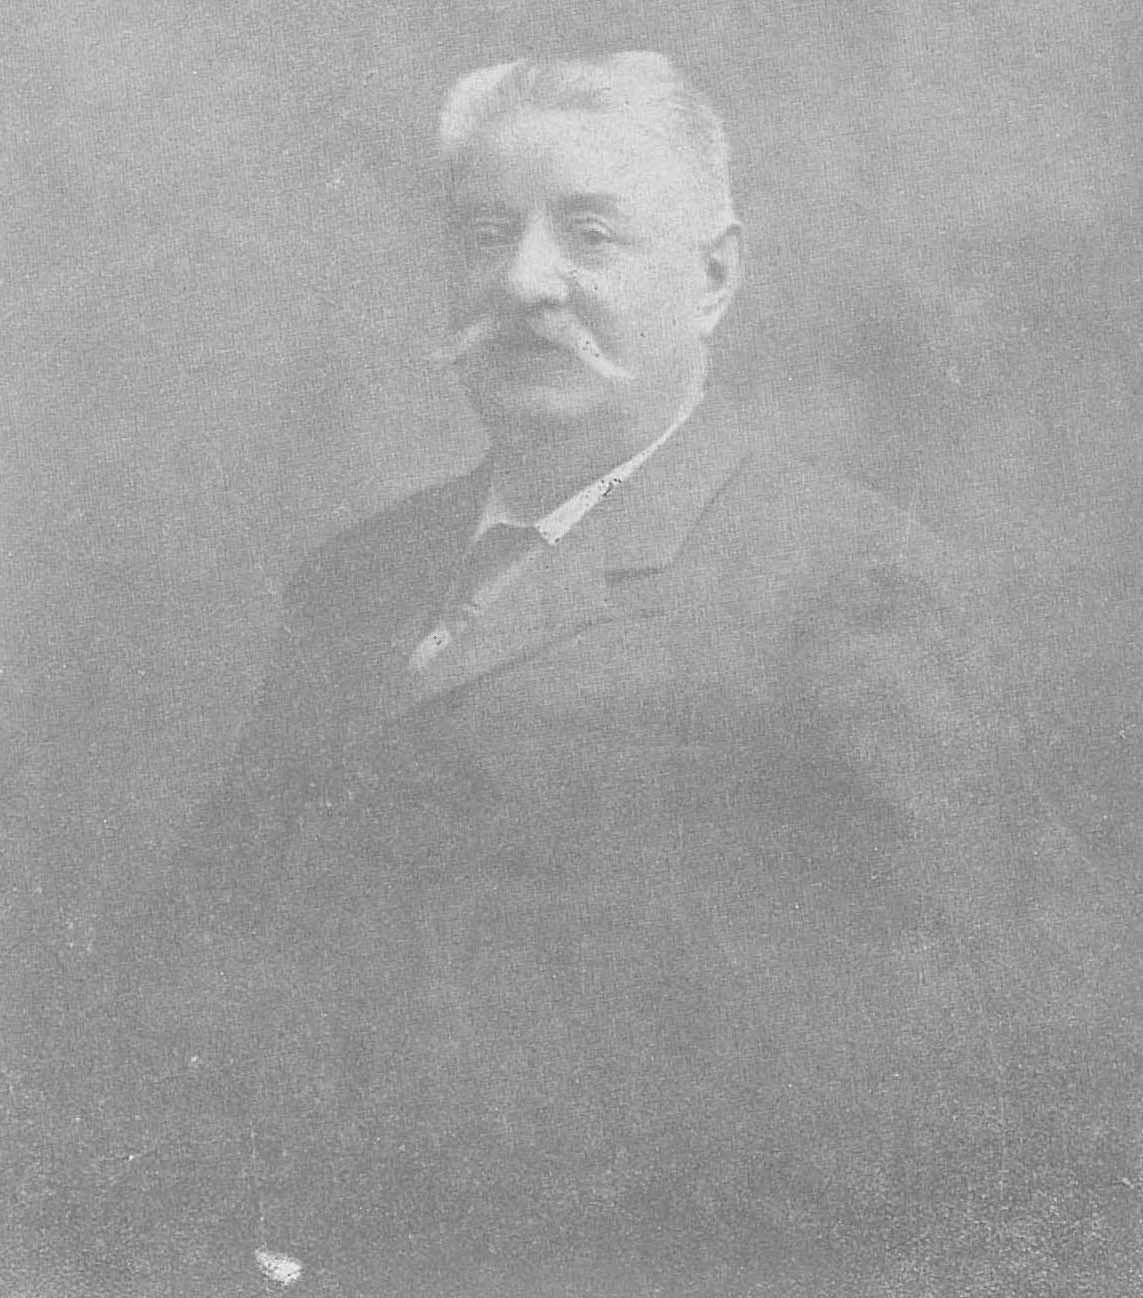 Dimitrie-Alexandrescu